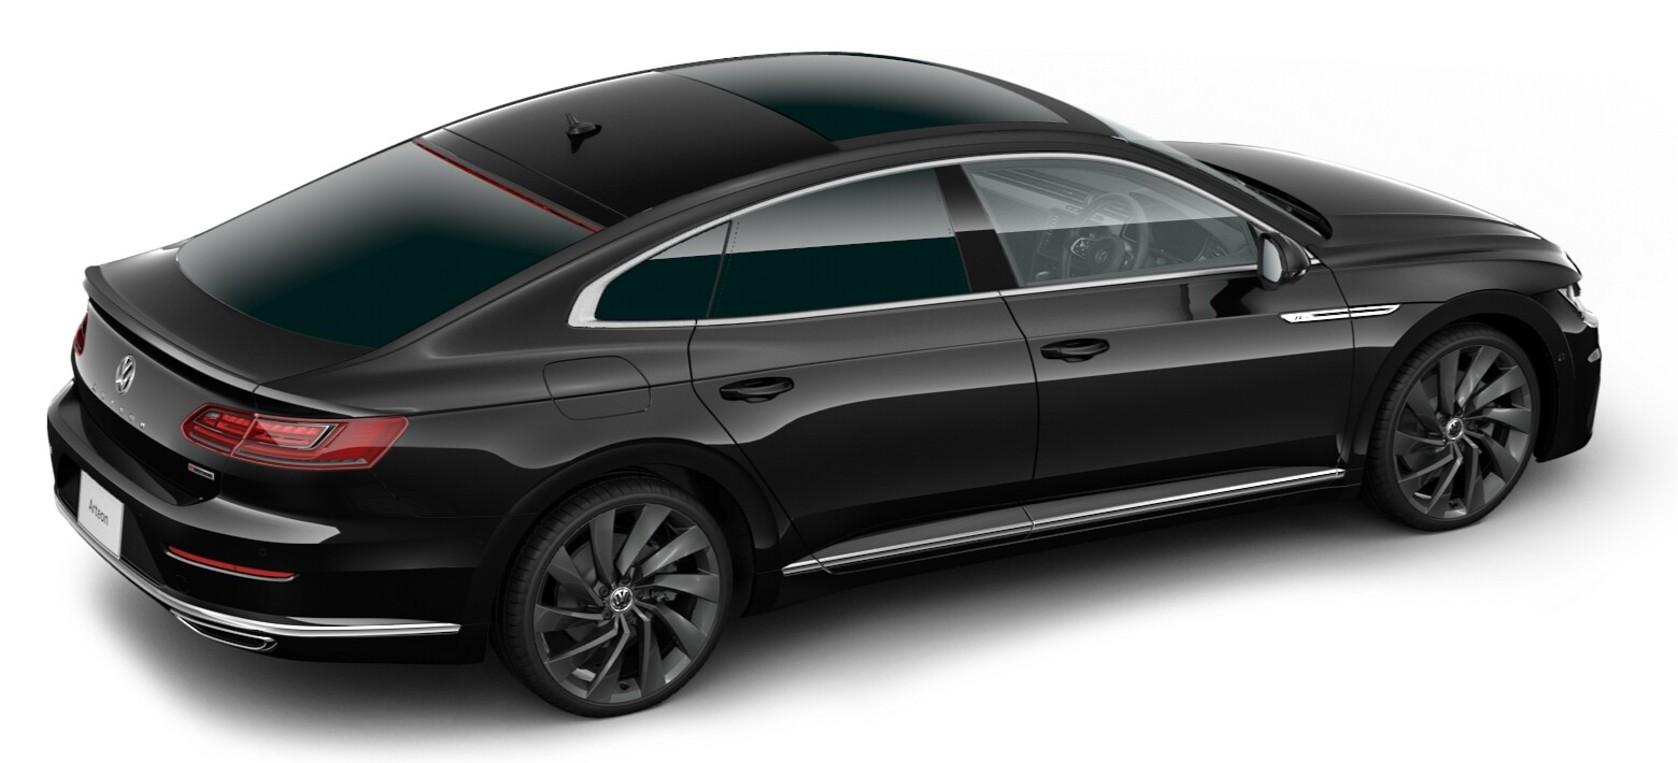 New Arteon R-Line 4MOTION Advanceラグジュアリーパッケージ装着車の画像3